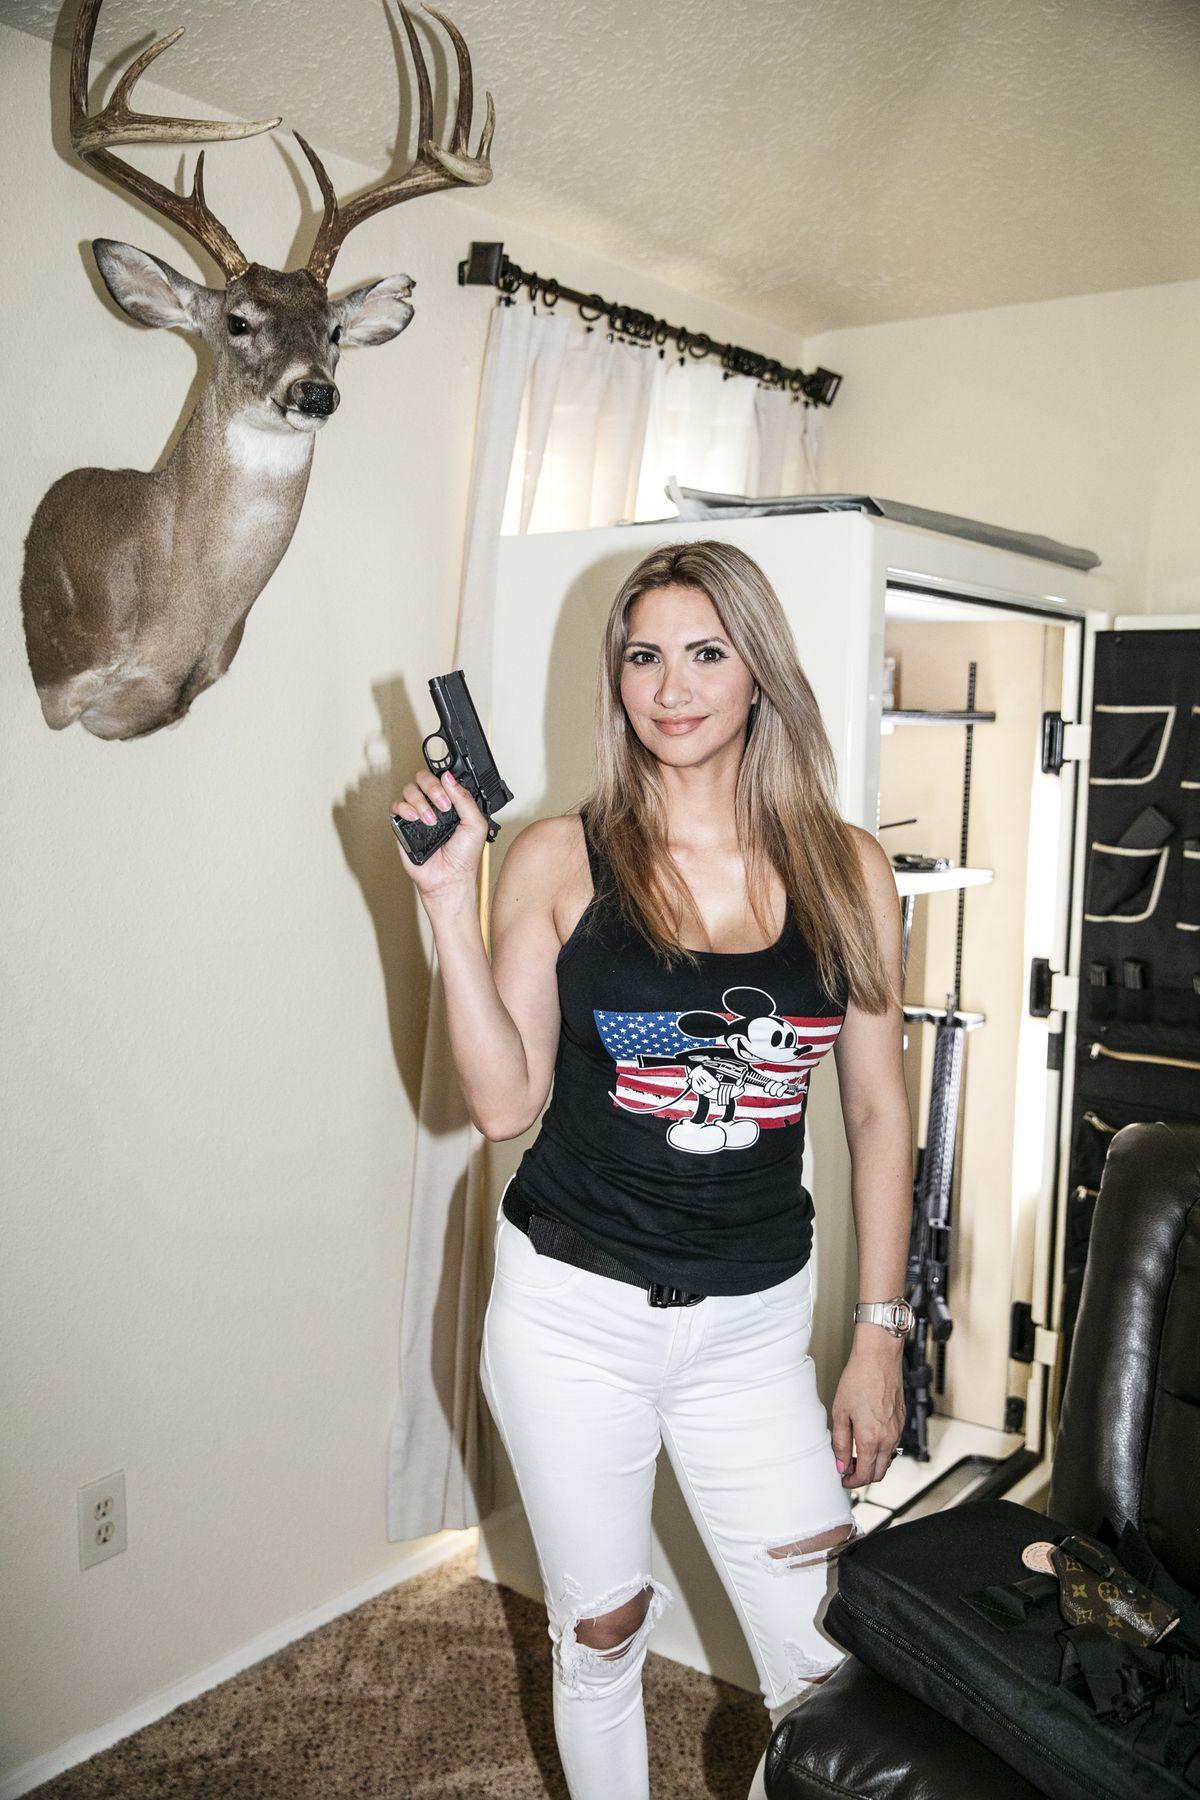 Gun influencers on Instagram are a boon to gun companies - Vox